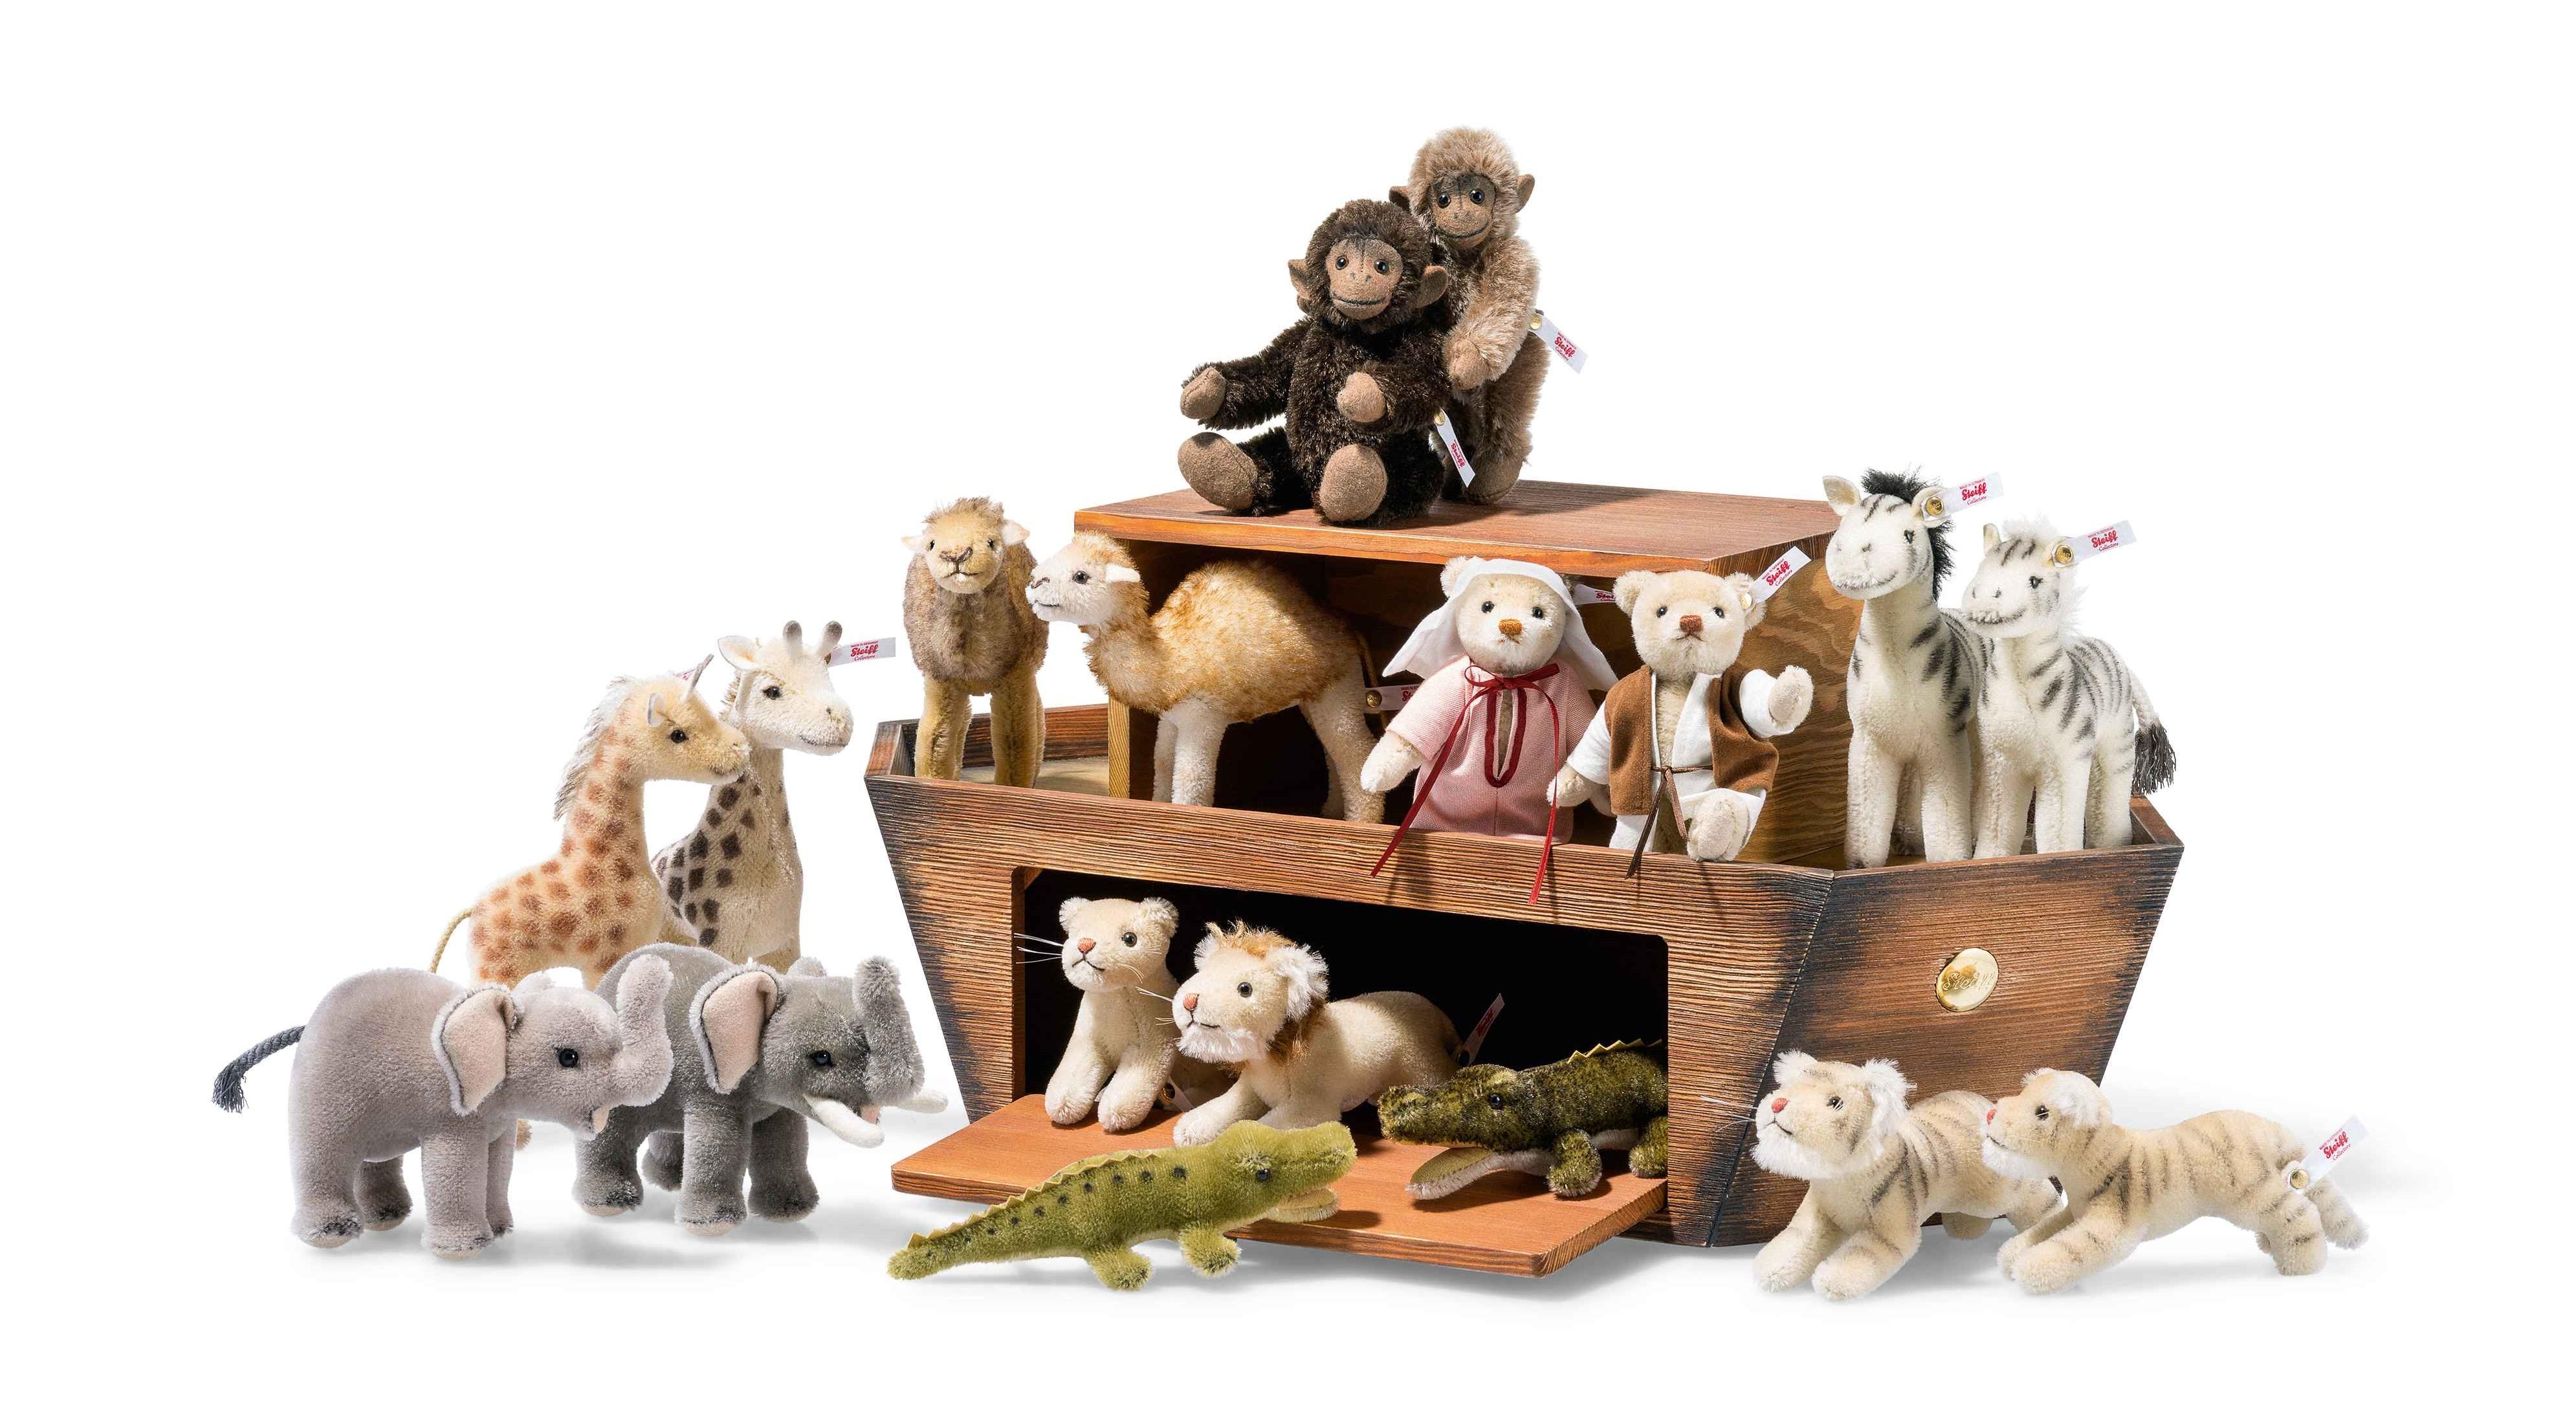 Noah's Ark Gift Set